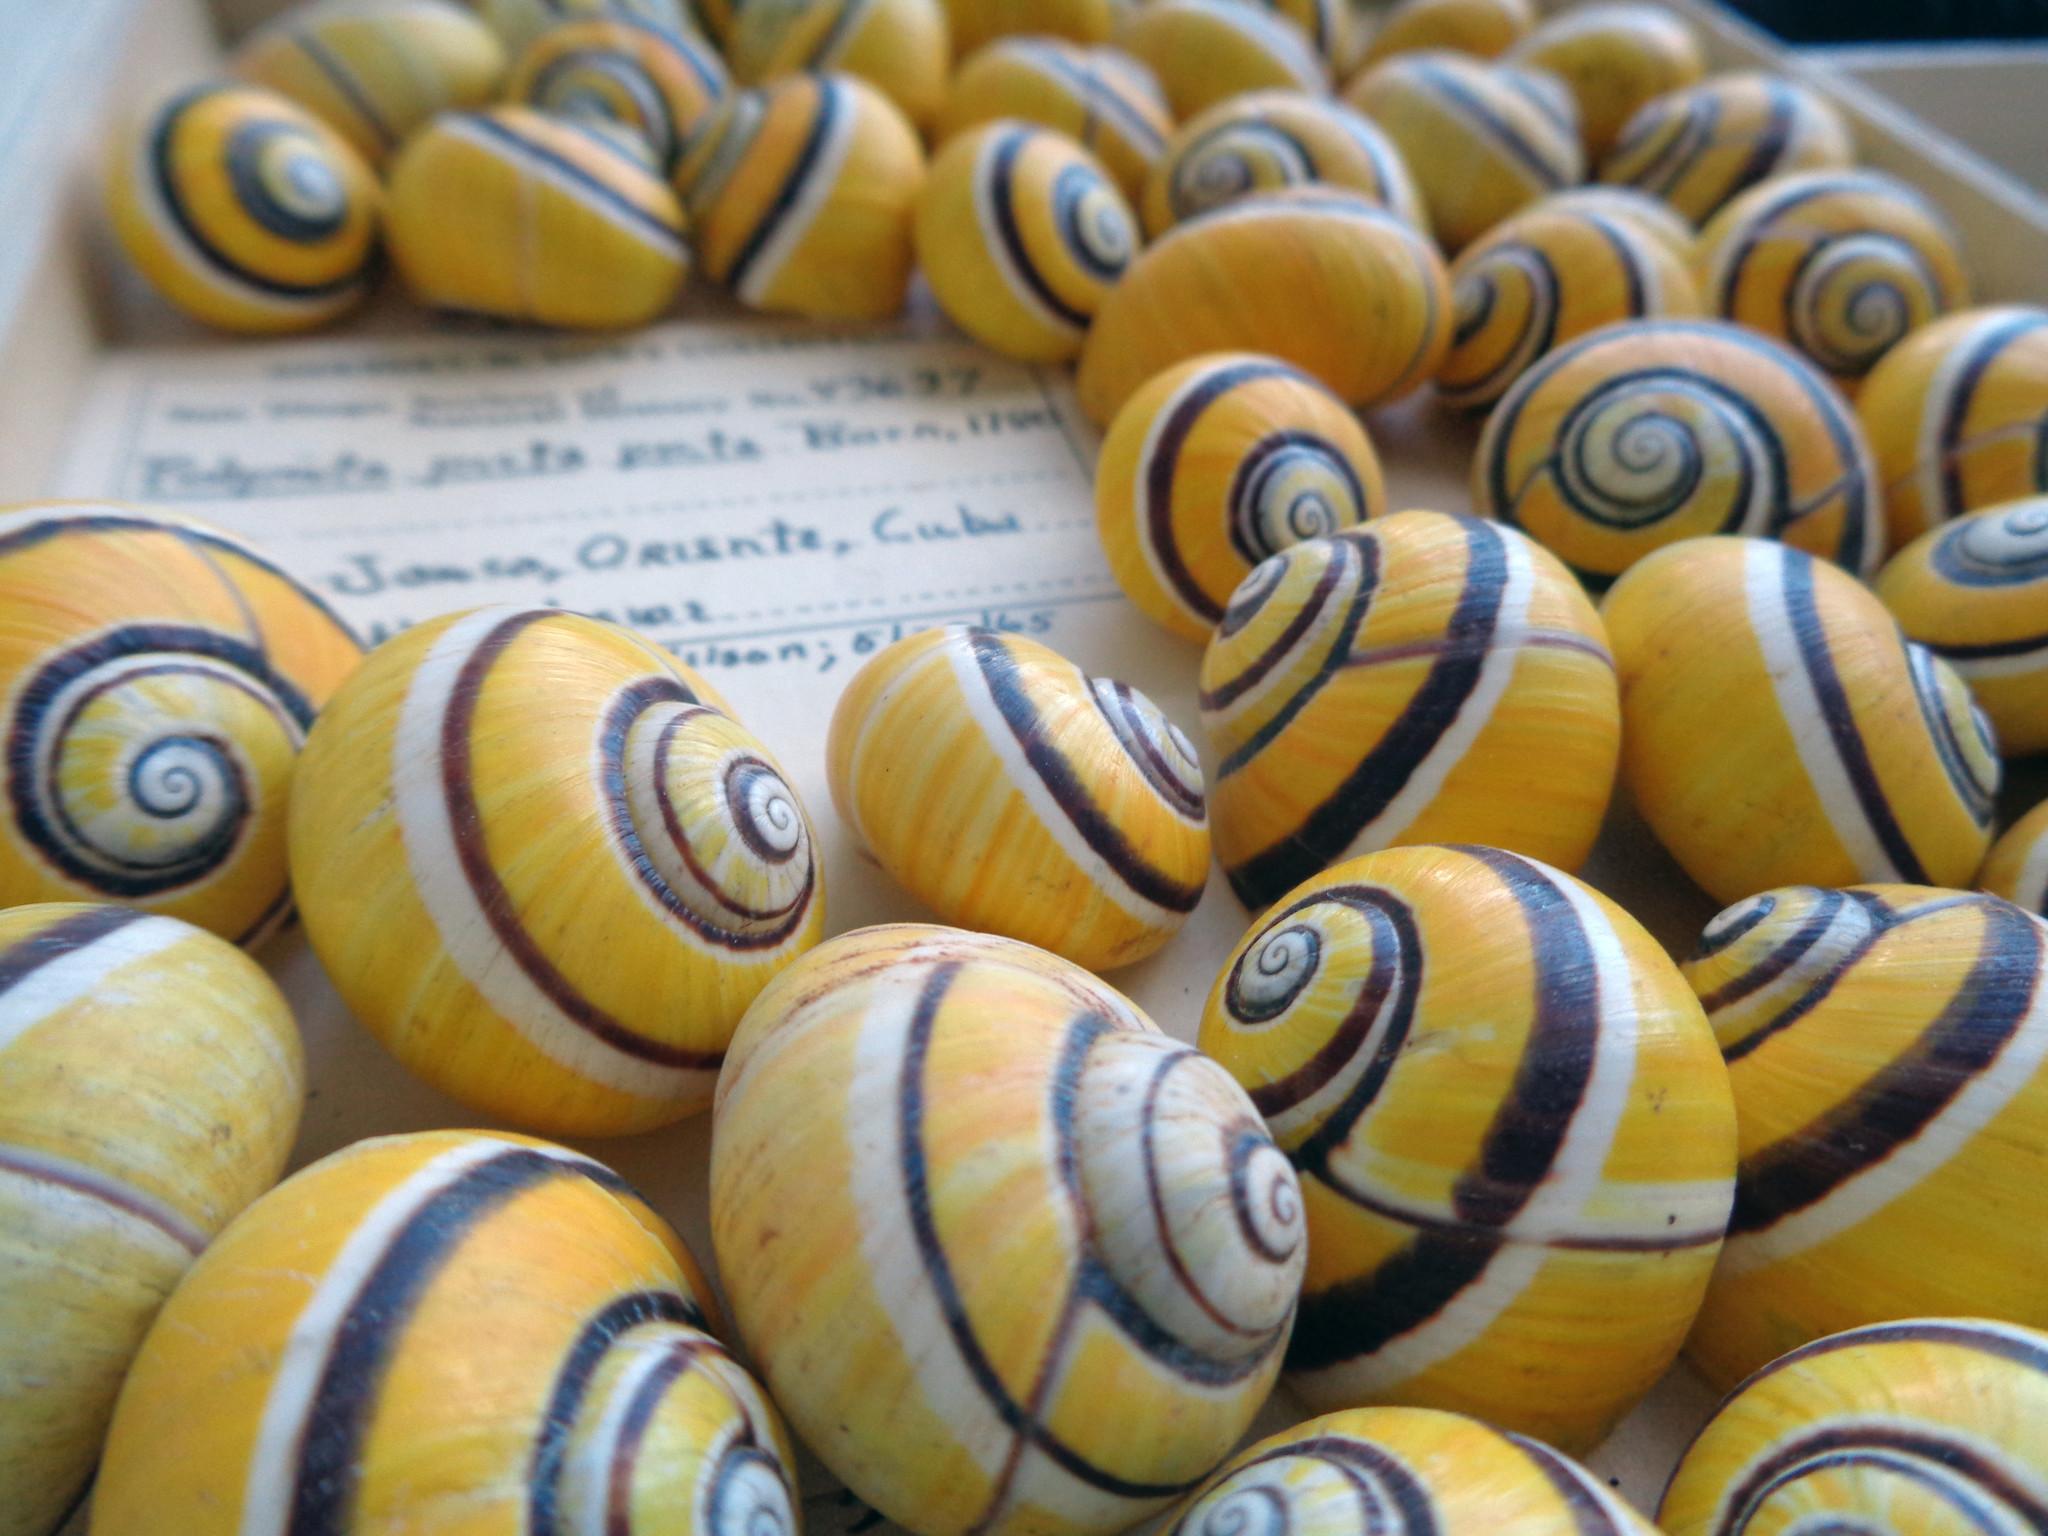 Stunning Polymita picta picta shells from Cuba.